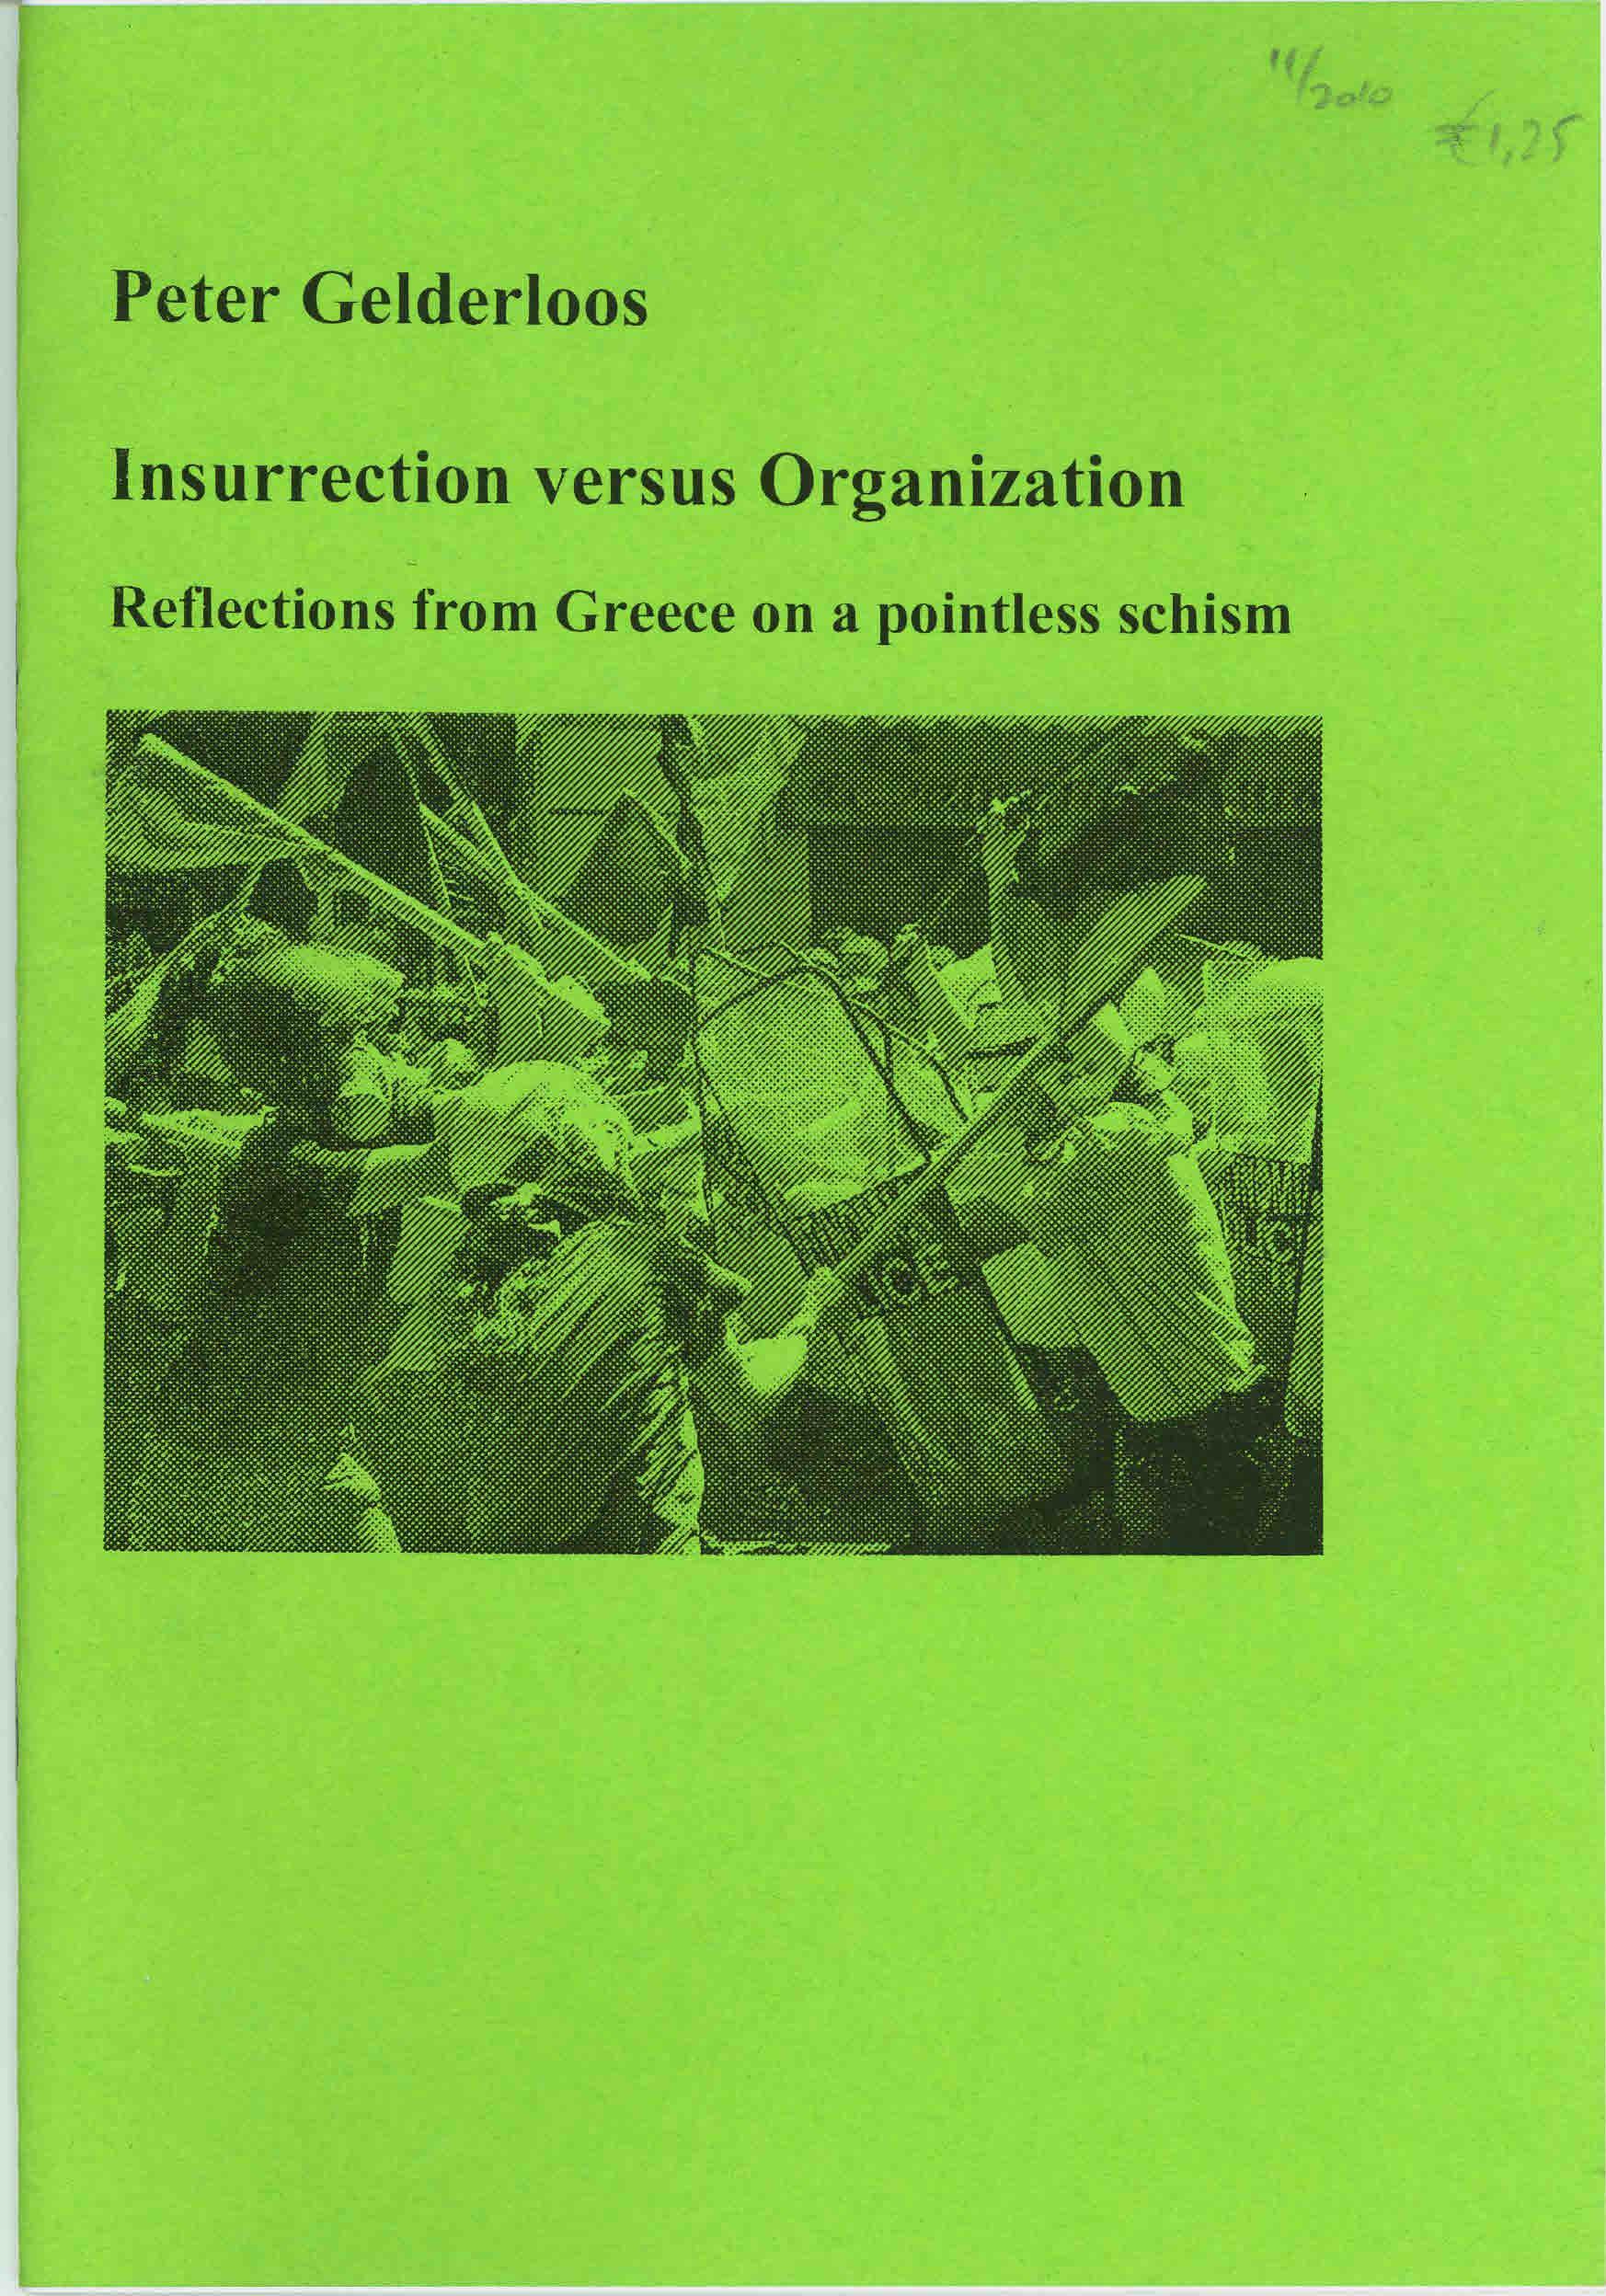 Insurrection versus Organization